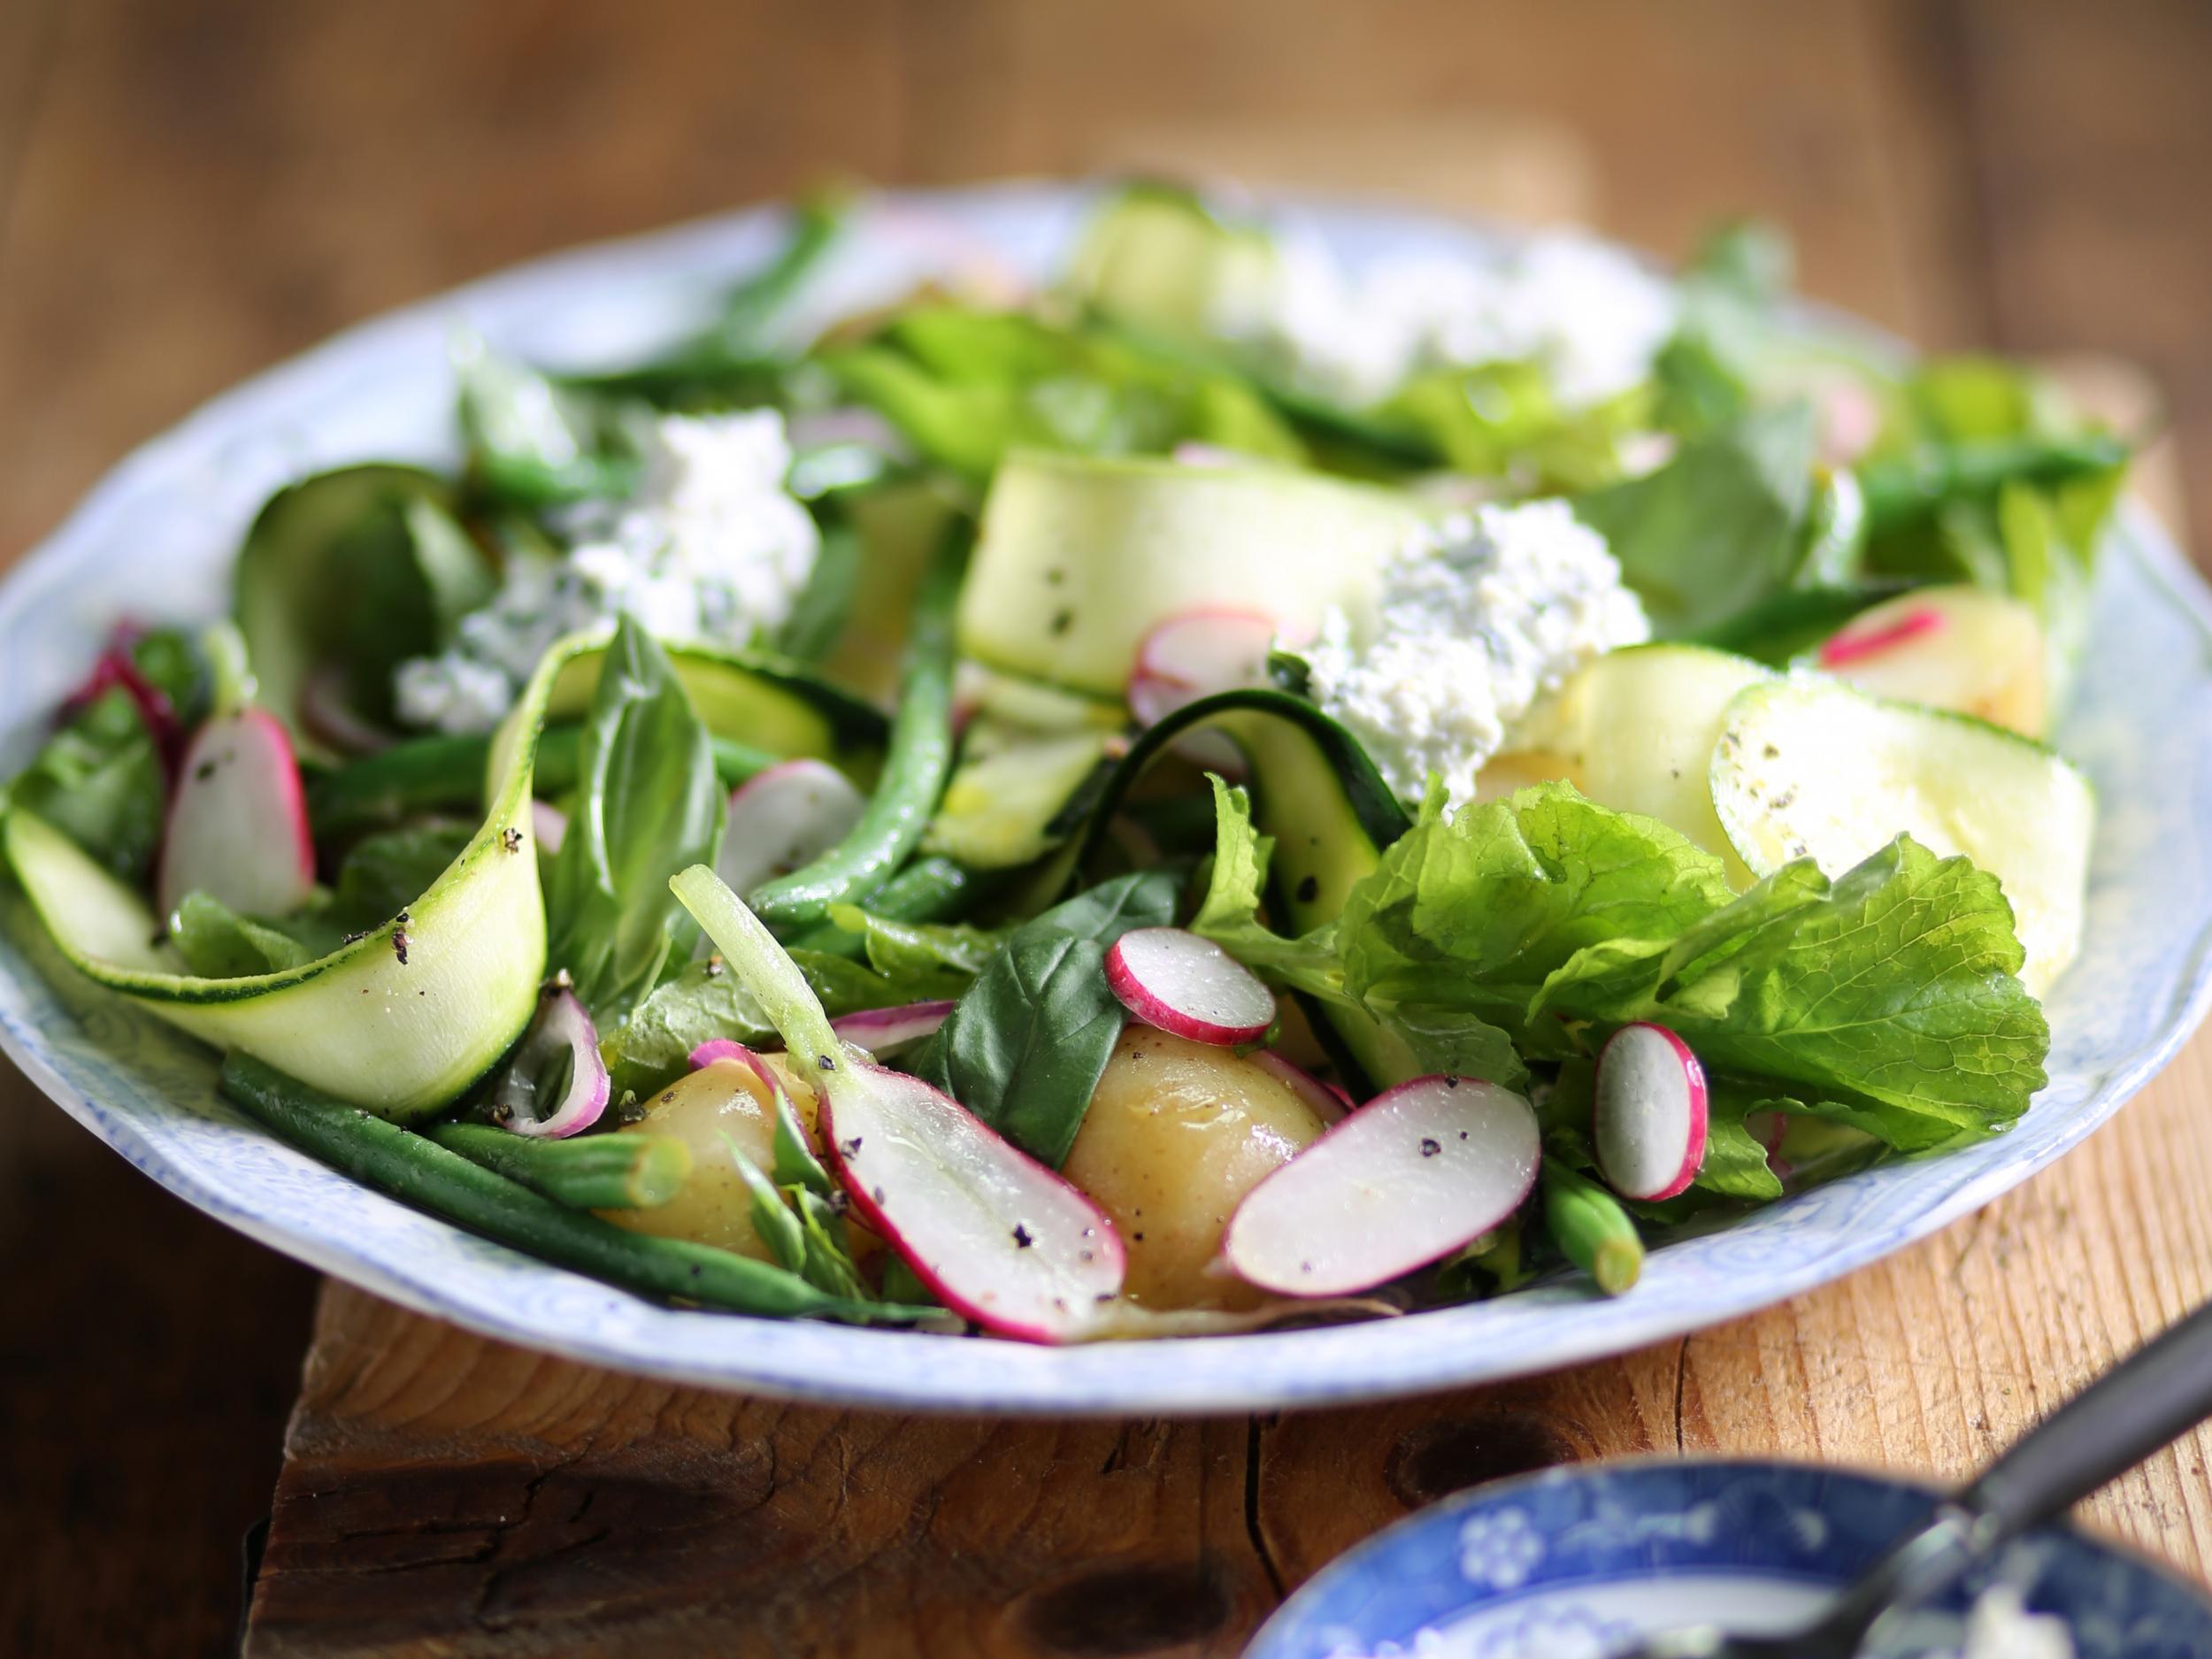 How to make Roman garden salad 1